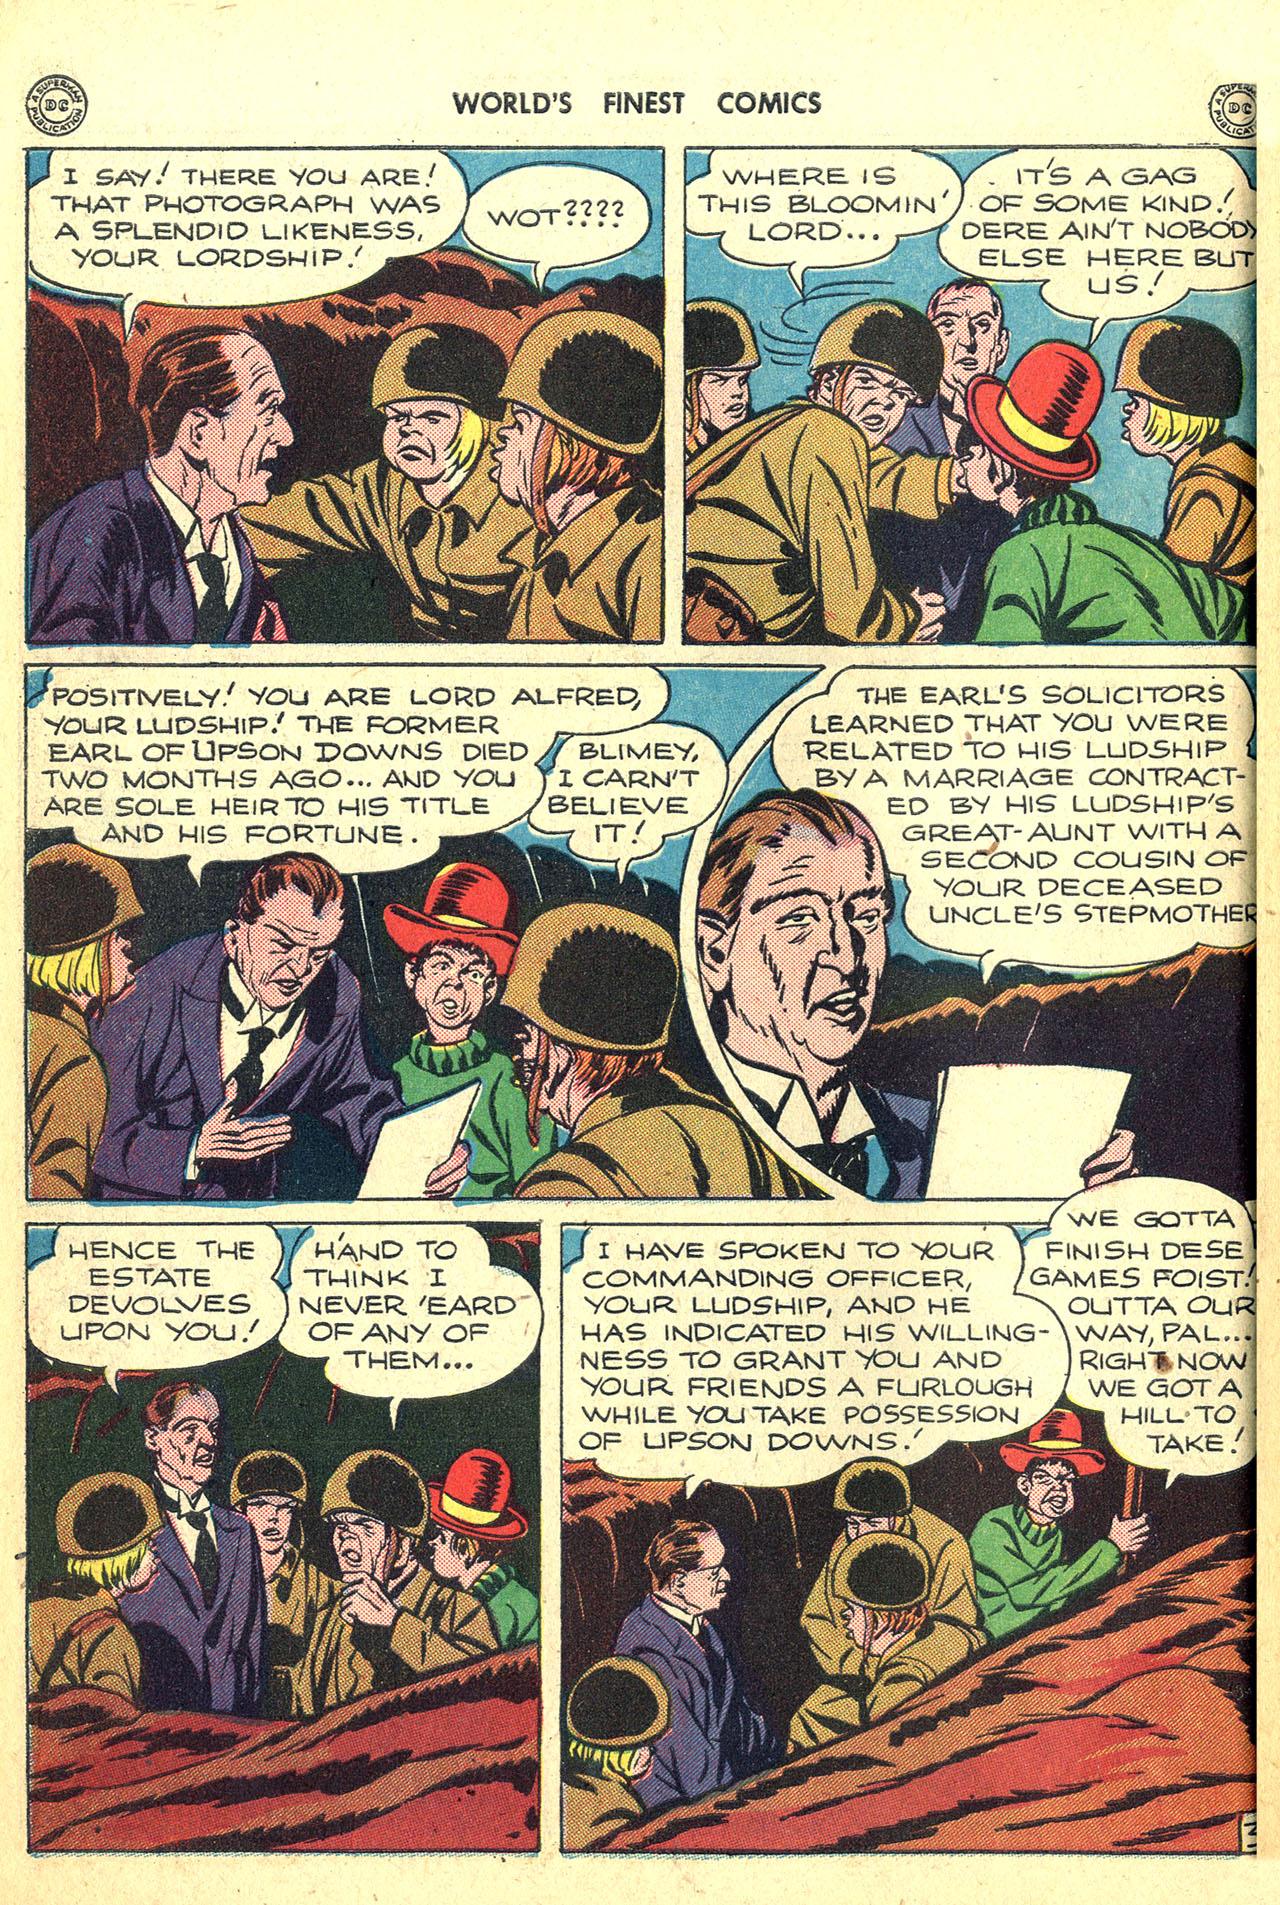 Read online World's Finest Comics comic -  Issue #18 - 38